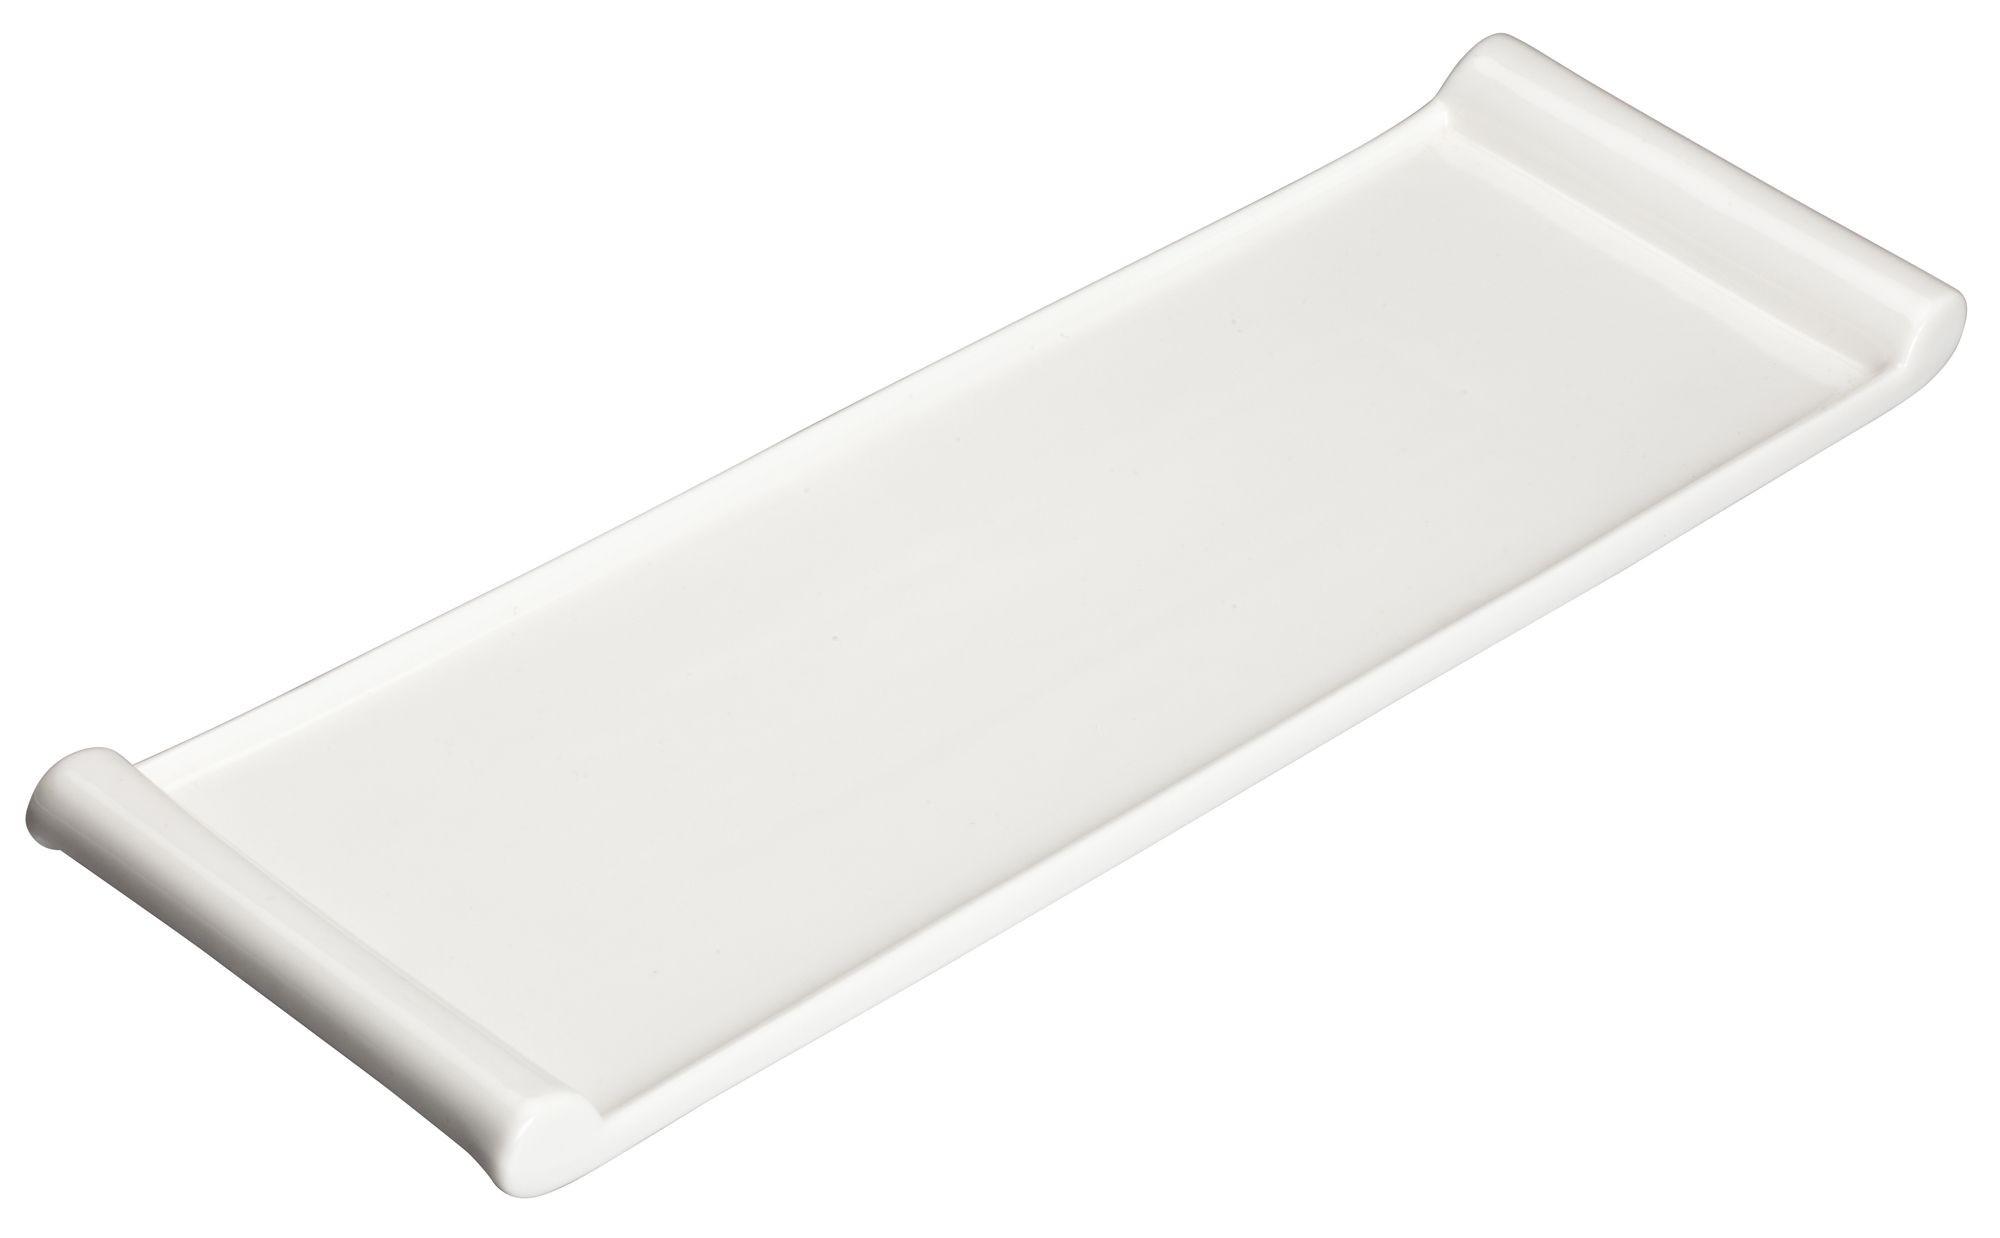 "Winco WDP017-117 Paredes Porcelain Bright White Rectangular Platter 16-1/4"" x 5"""